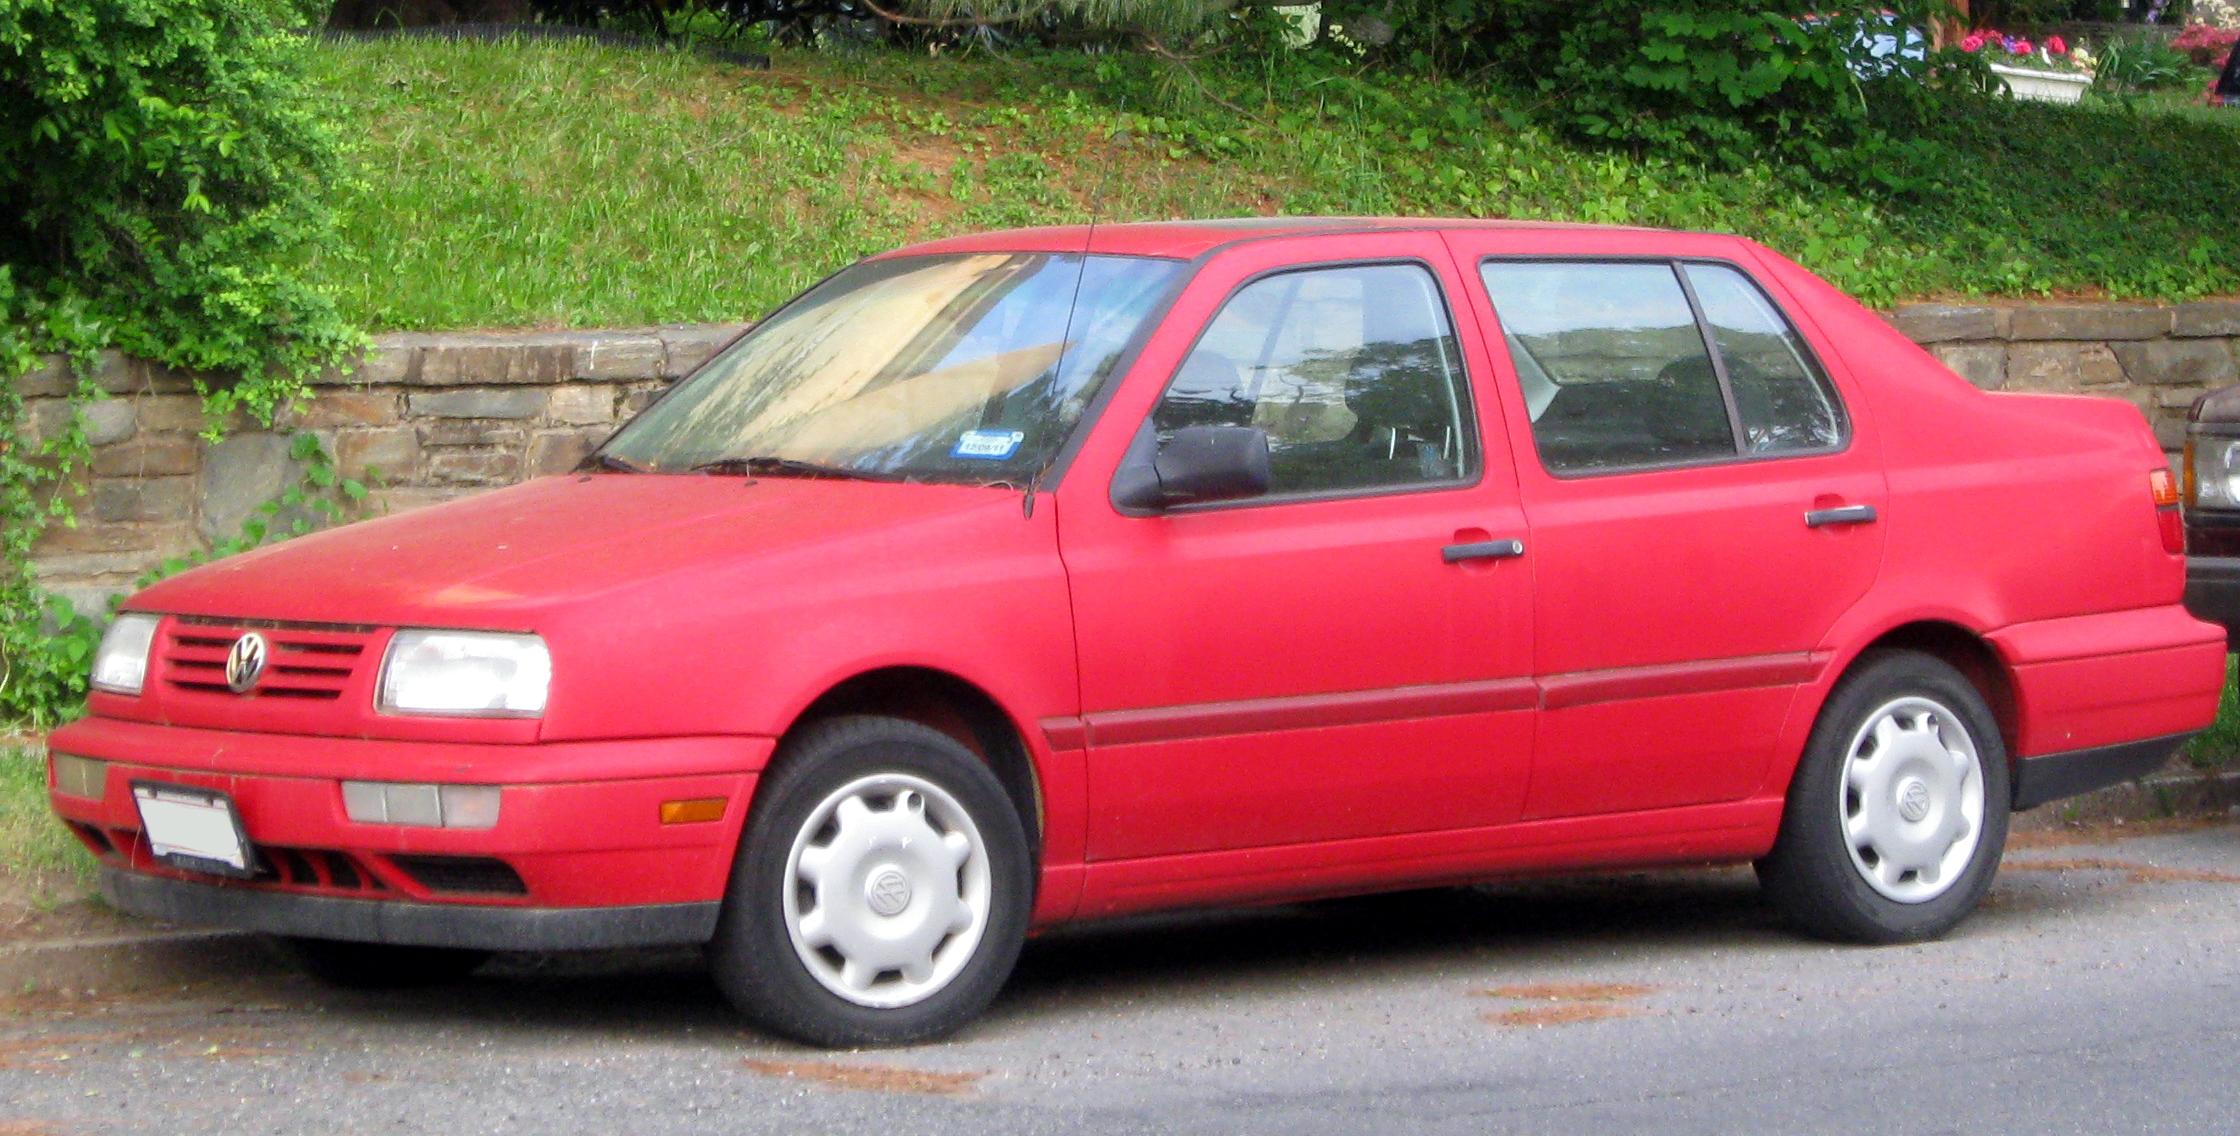 File:1996-1998 Volkswagen Jetta -- 05-12-2011 1.